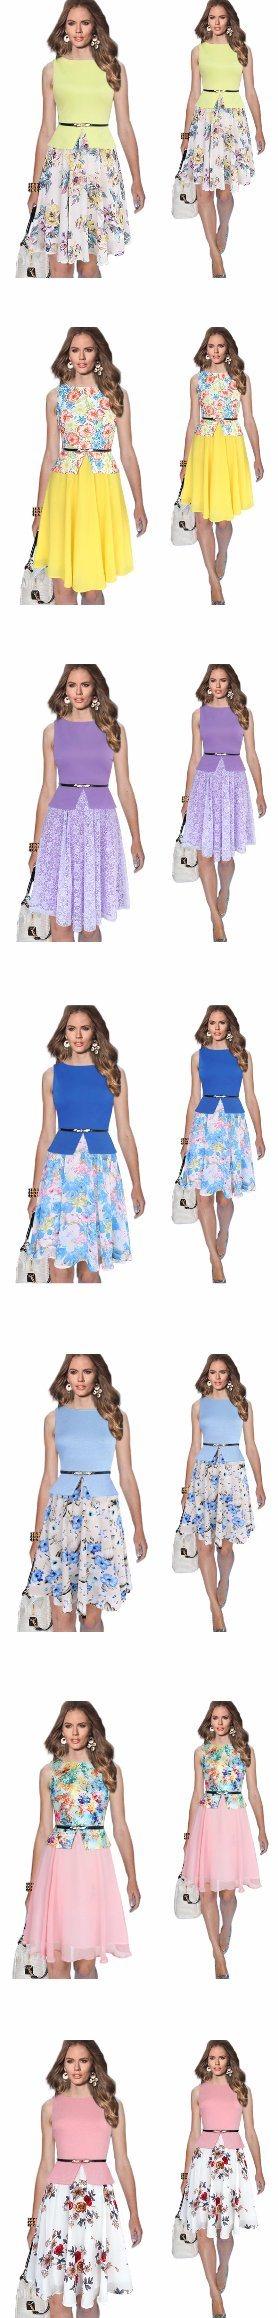 Women Casual Dress Women Office Dress